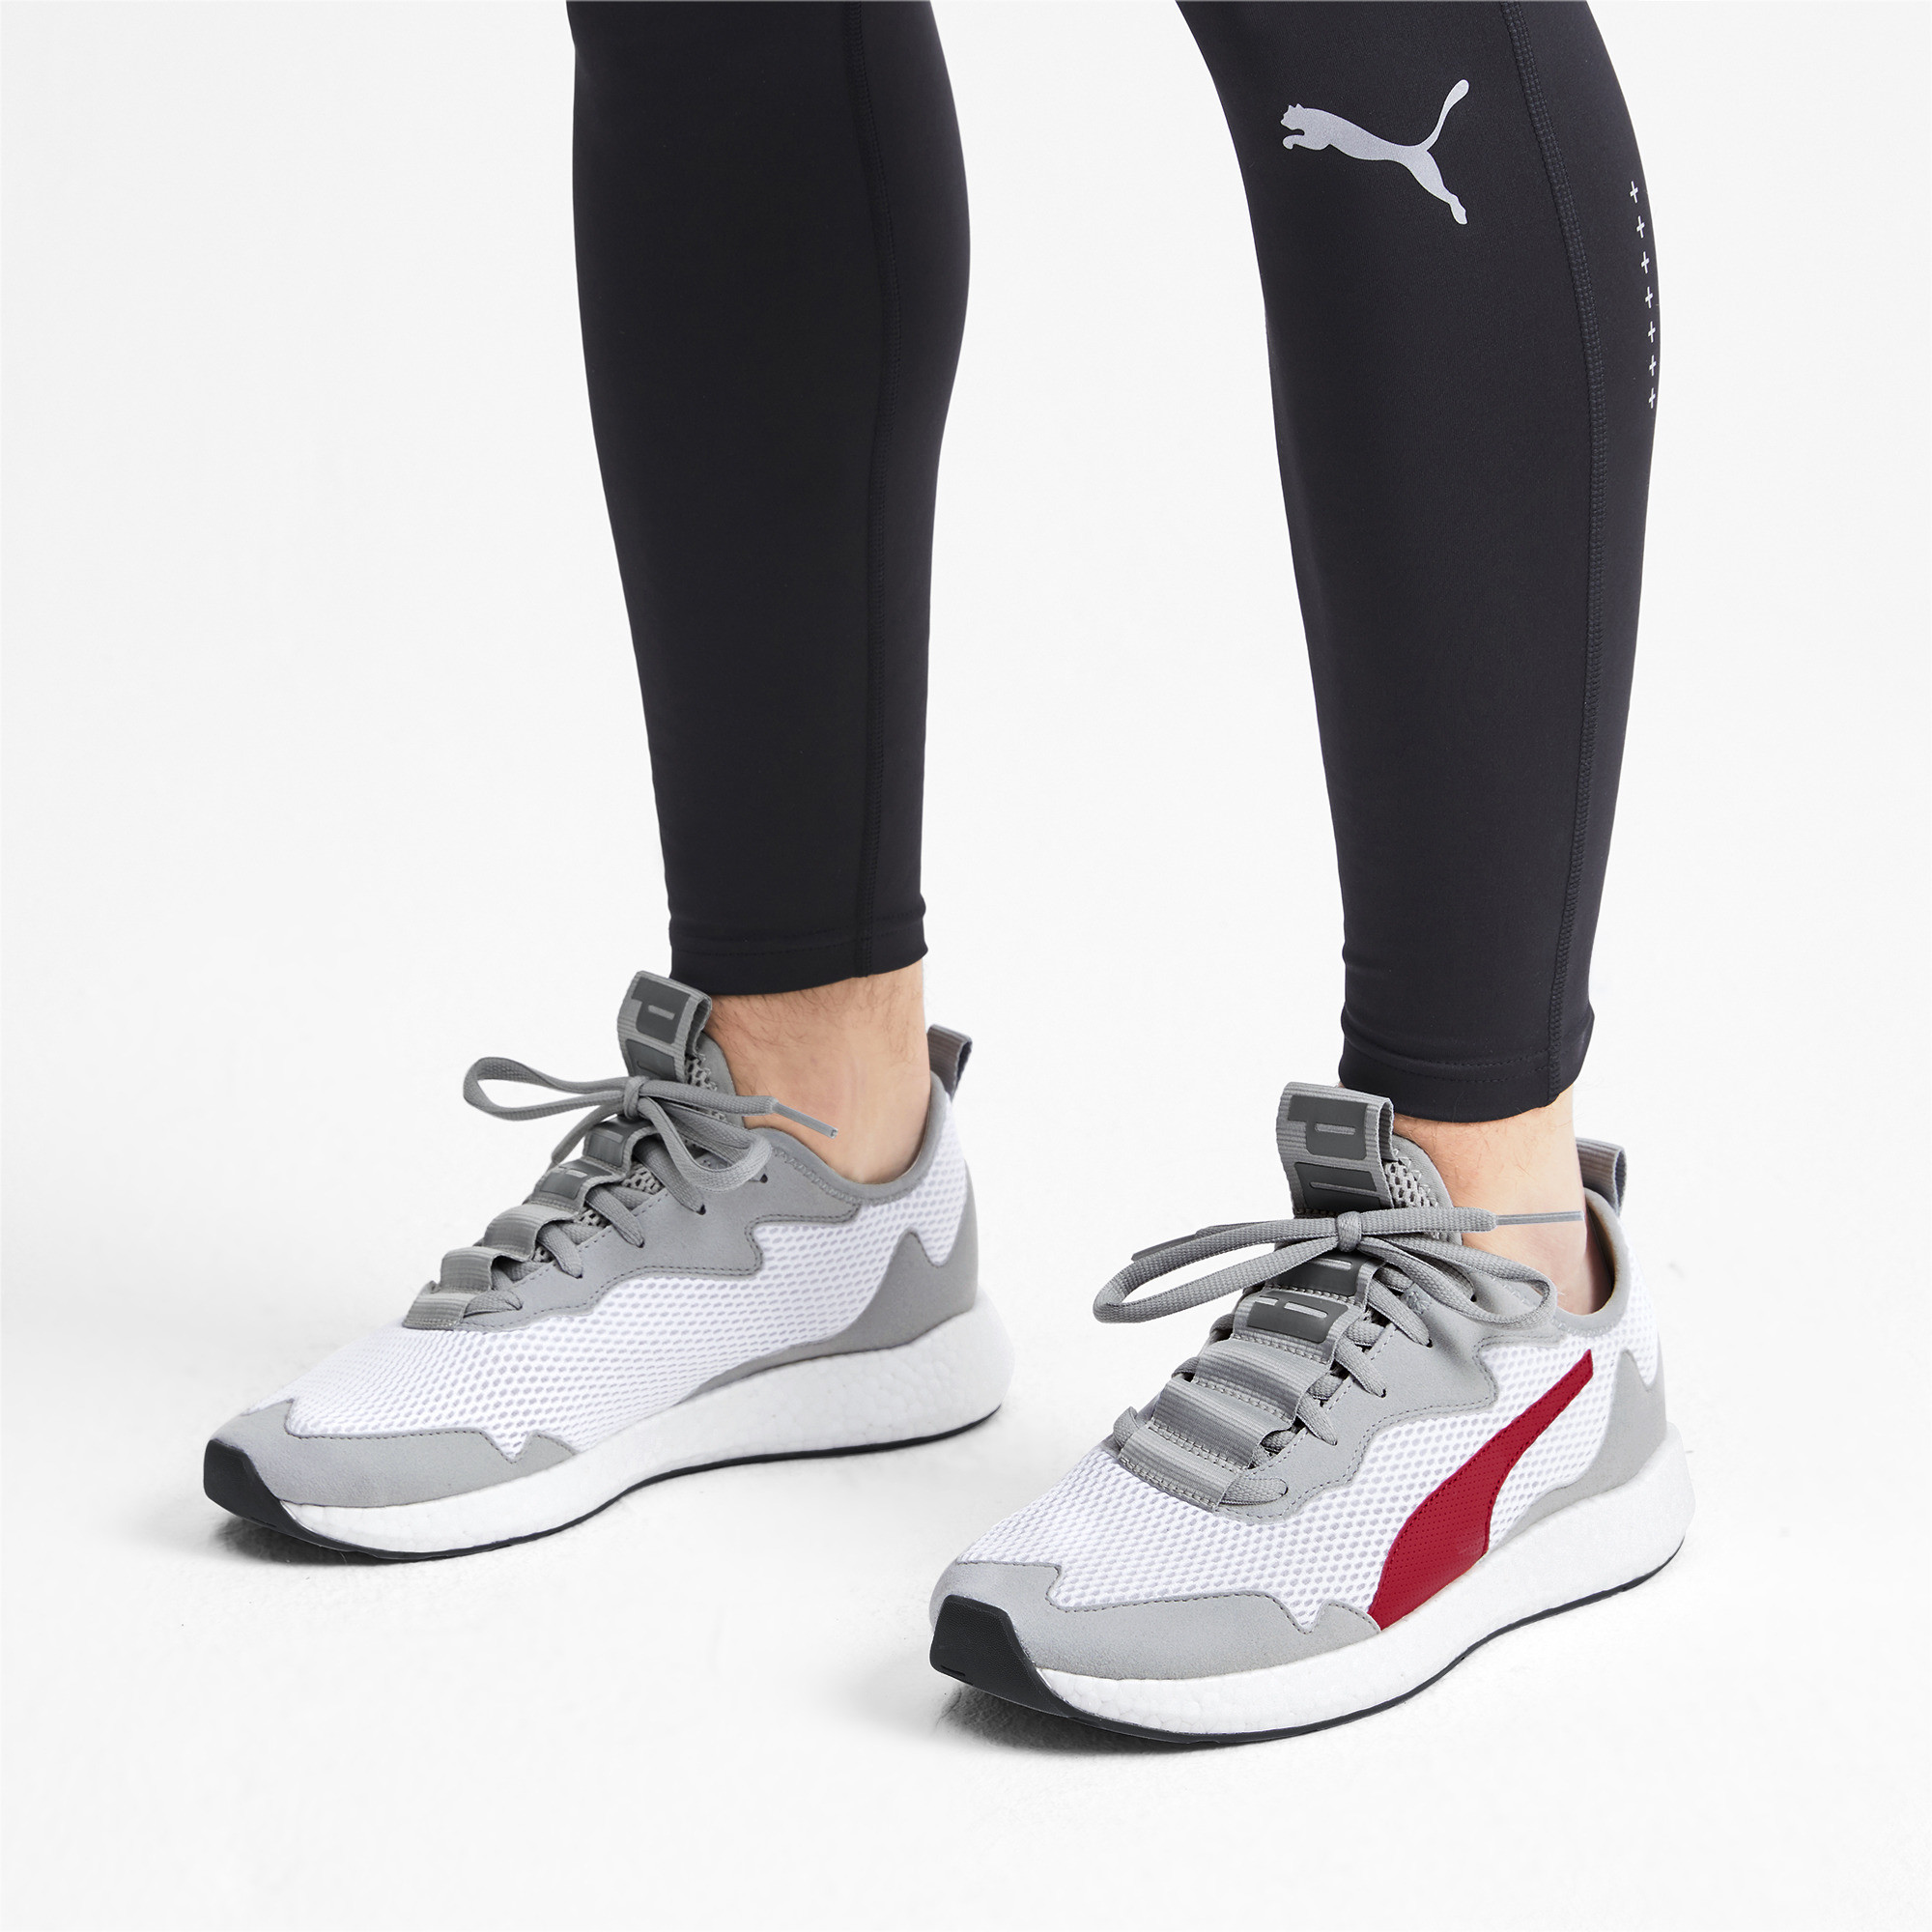 PUMA-NRGY-Neko-Skim-Men-s-Running-Shoes-Men-Shoe-Running thumbnail 5